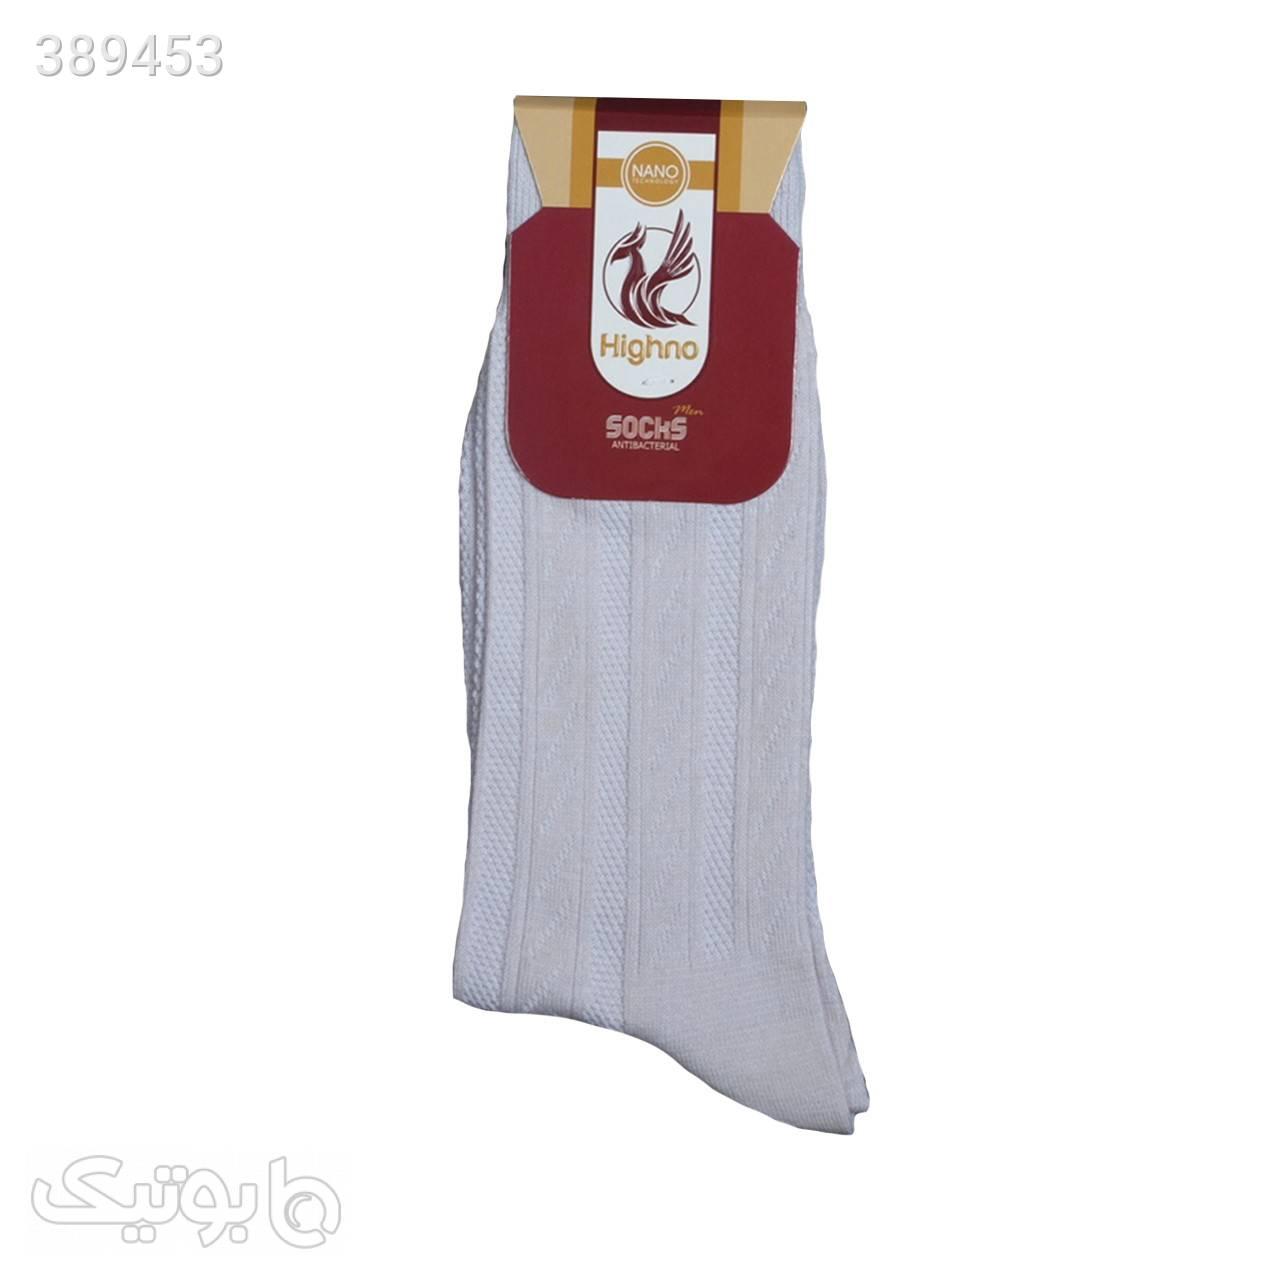 جوراب آنتی باکتریال مردانه مدل 08-1071 سفید جوراب و پاپوش